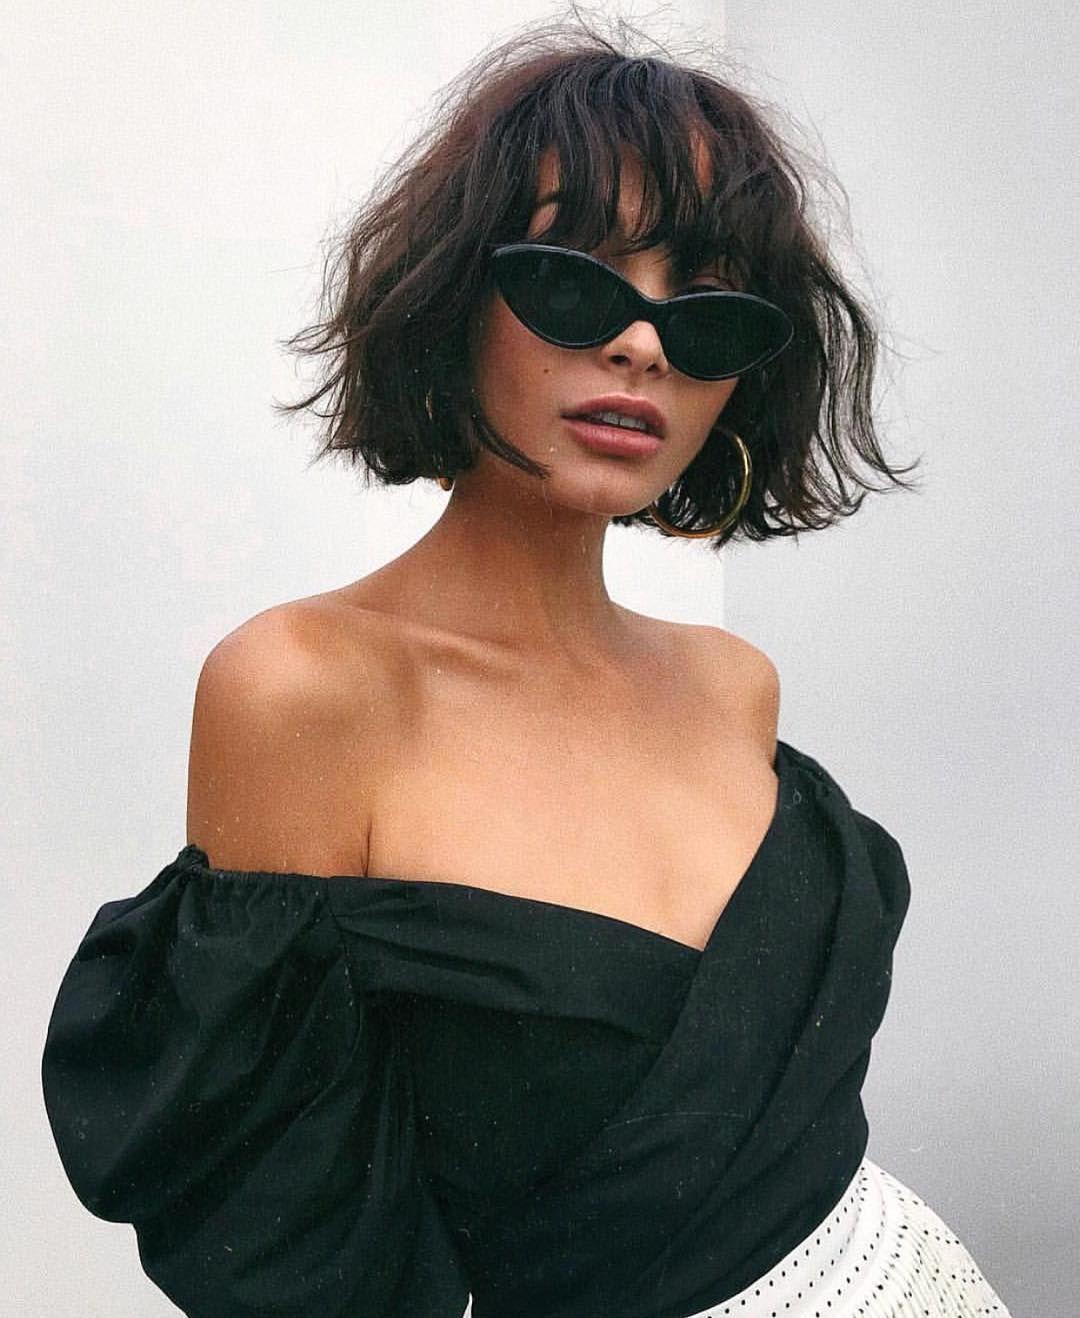 popular international hair trends haircuts photos 波波 烫